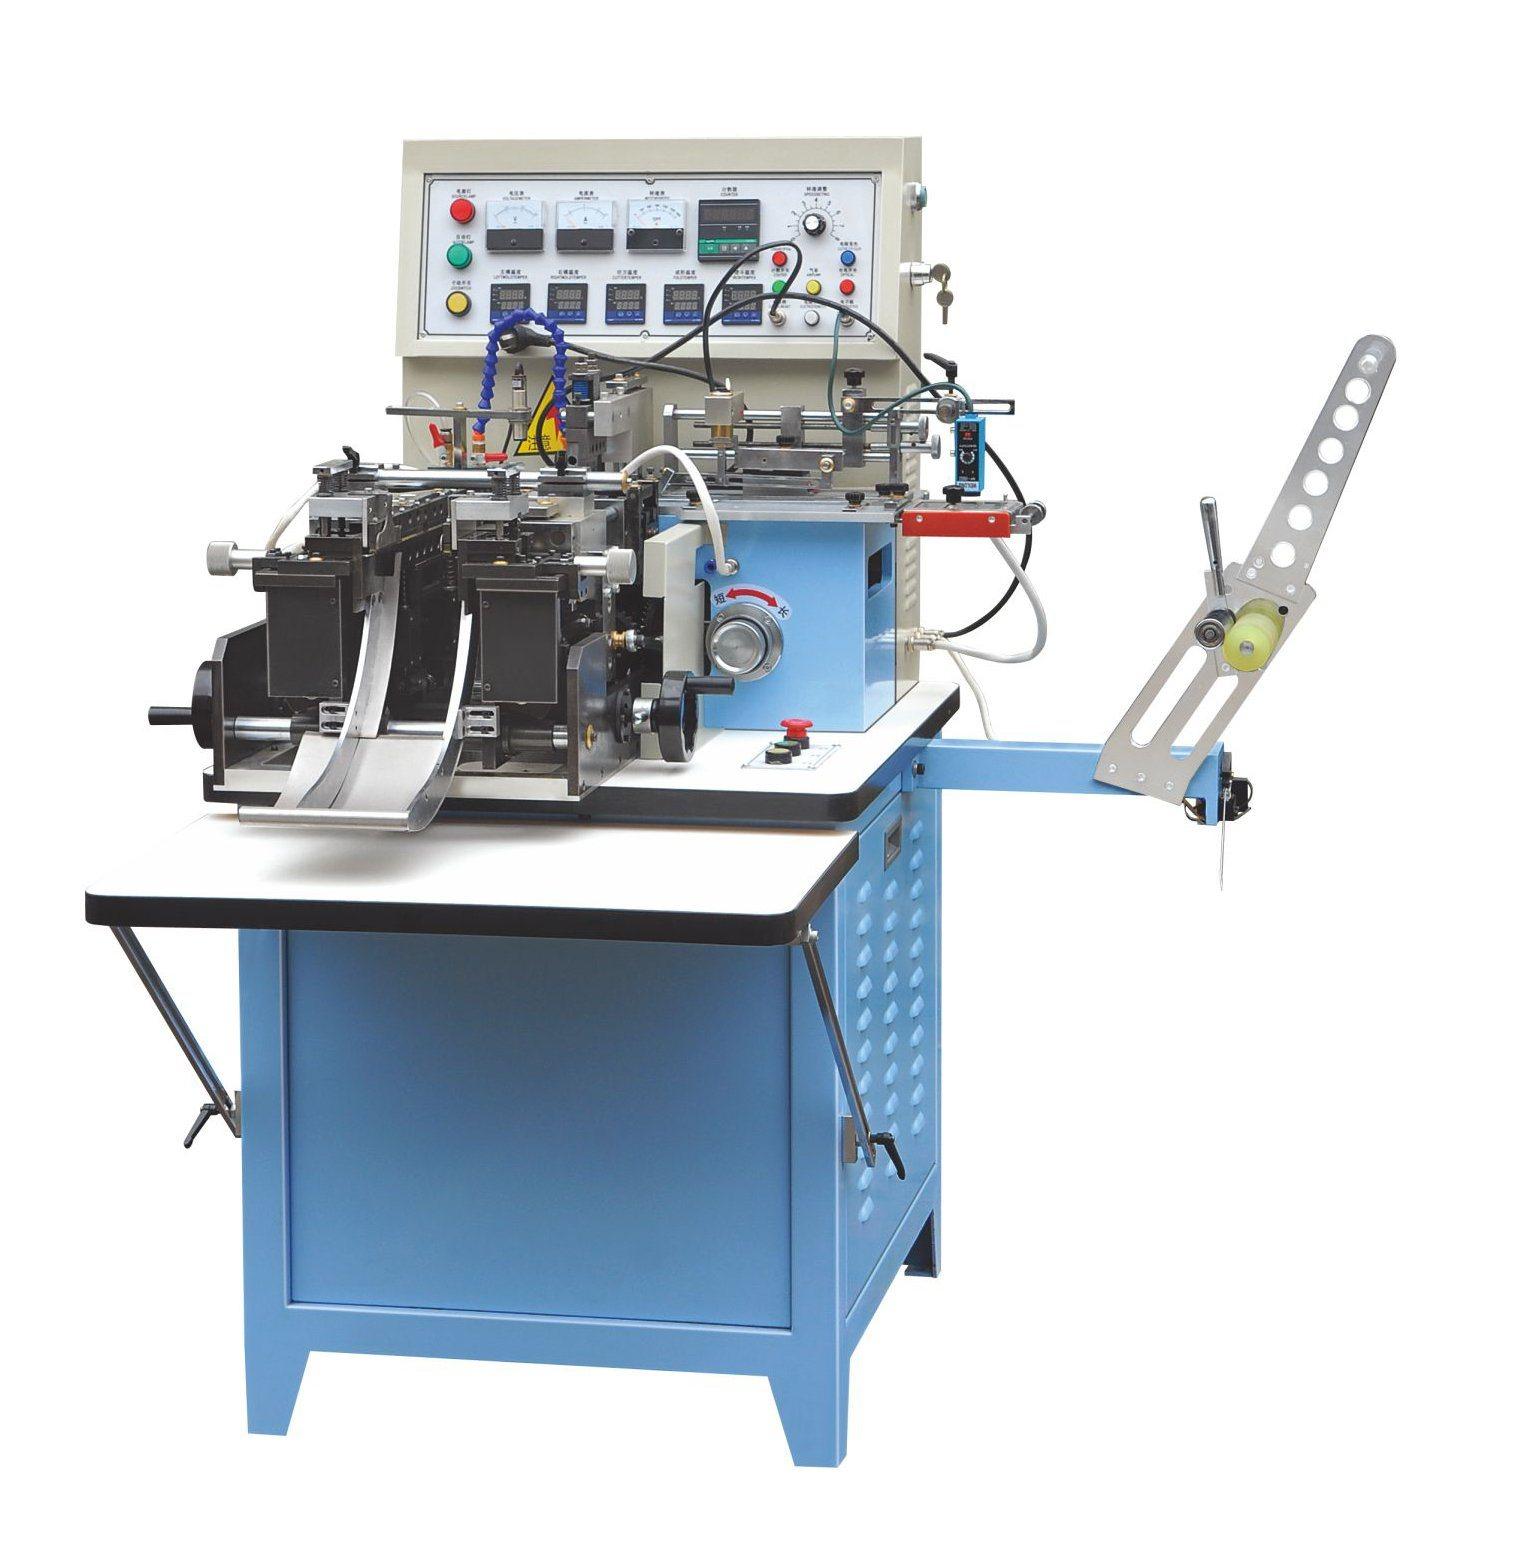 China Label Cutting and Folding Machine for Silk Ribbon Clothing Wash Care  Label - China Cutting Machine, Folding Machine